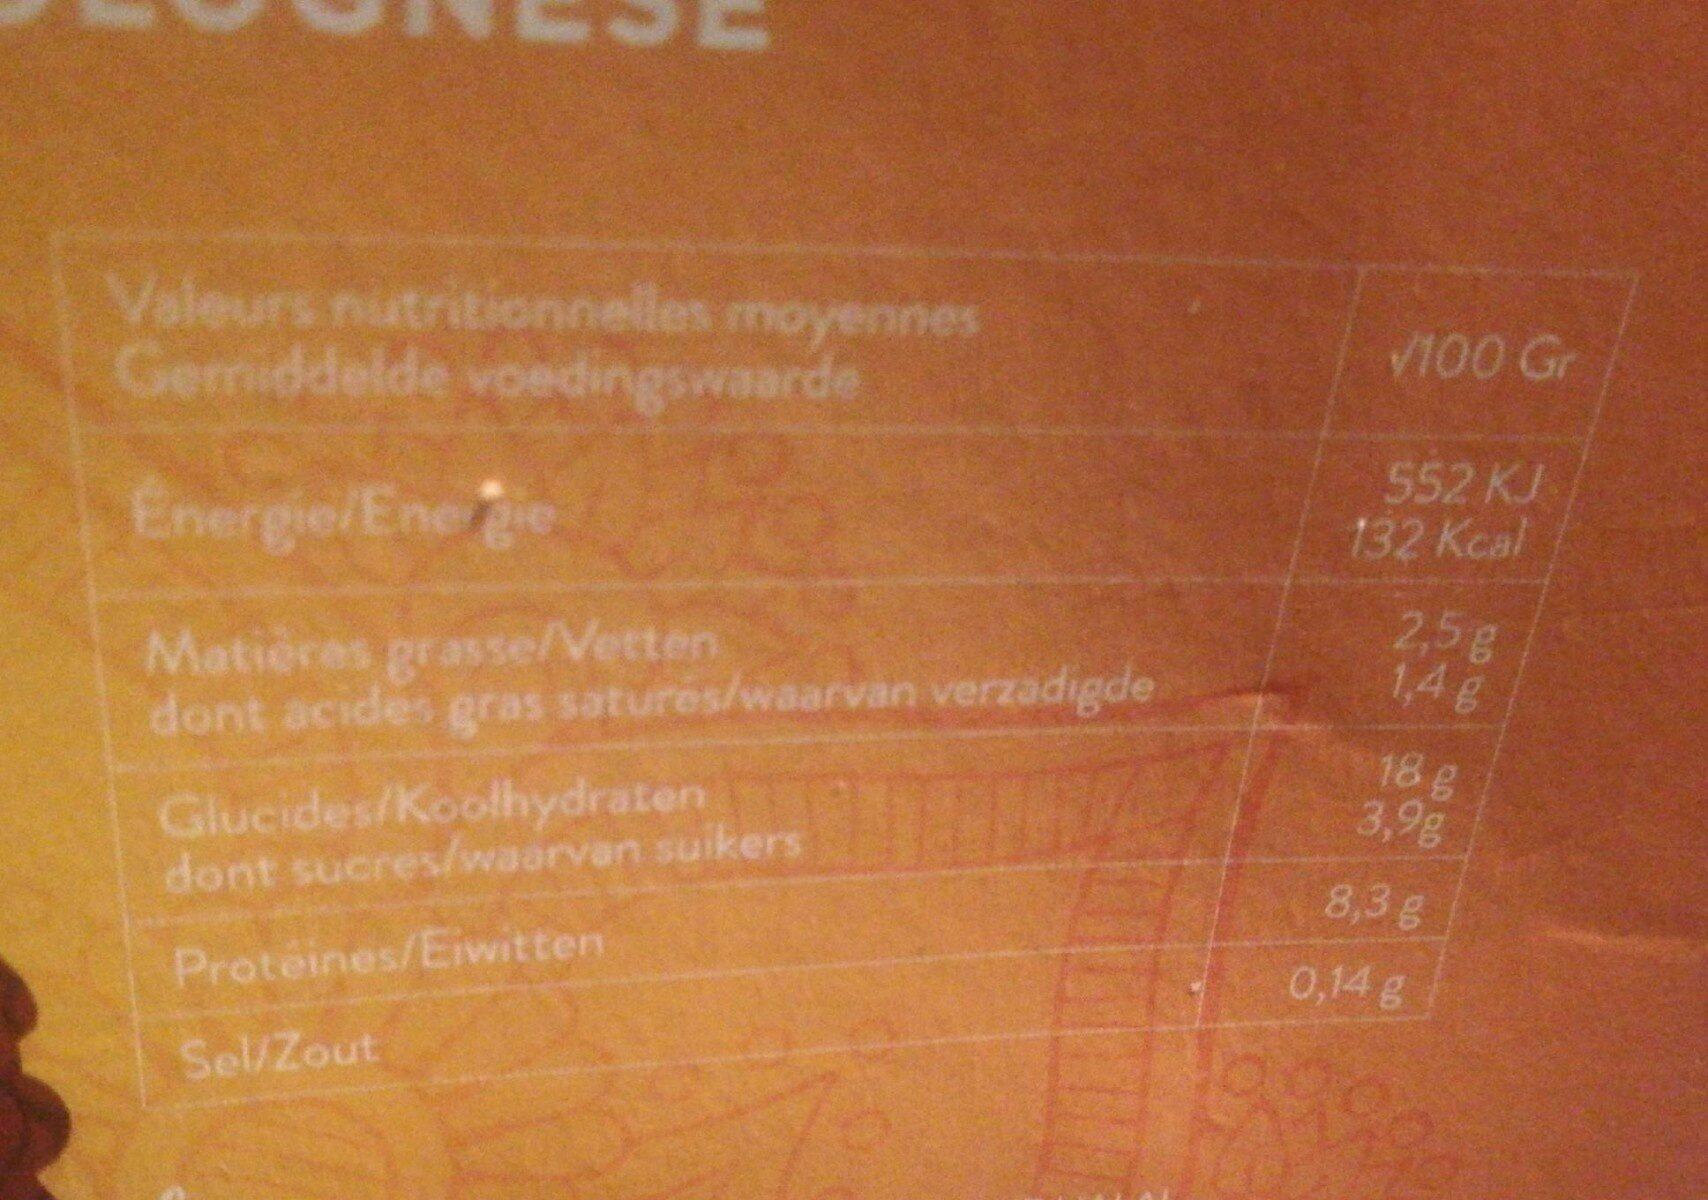 Lasagne Bolognaise 100% boeuf - Voedingswaarden - fr